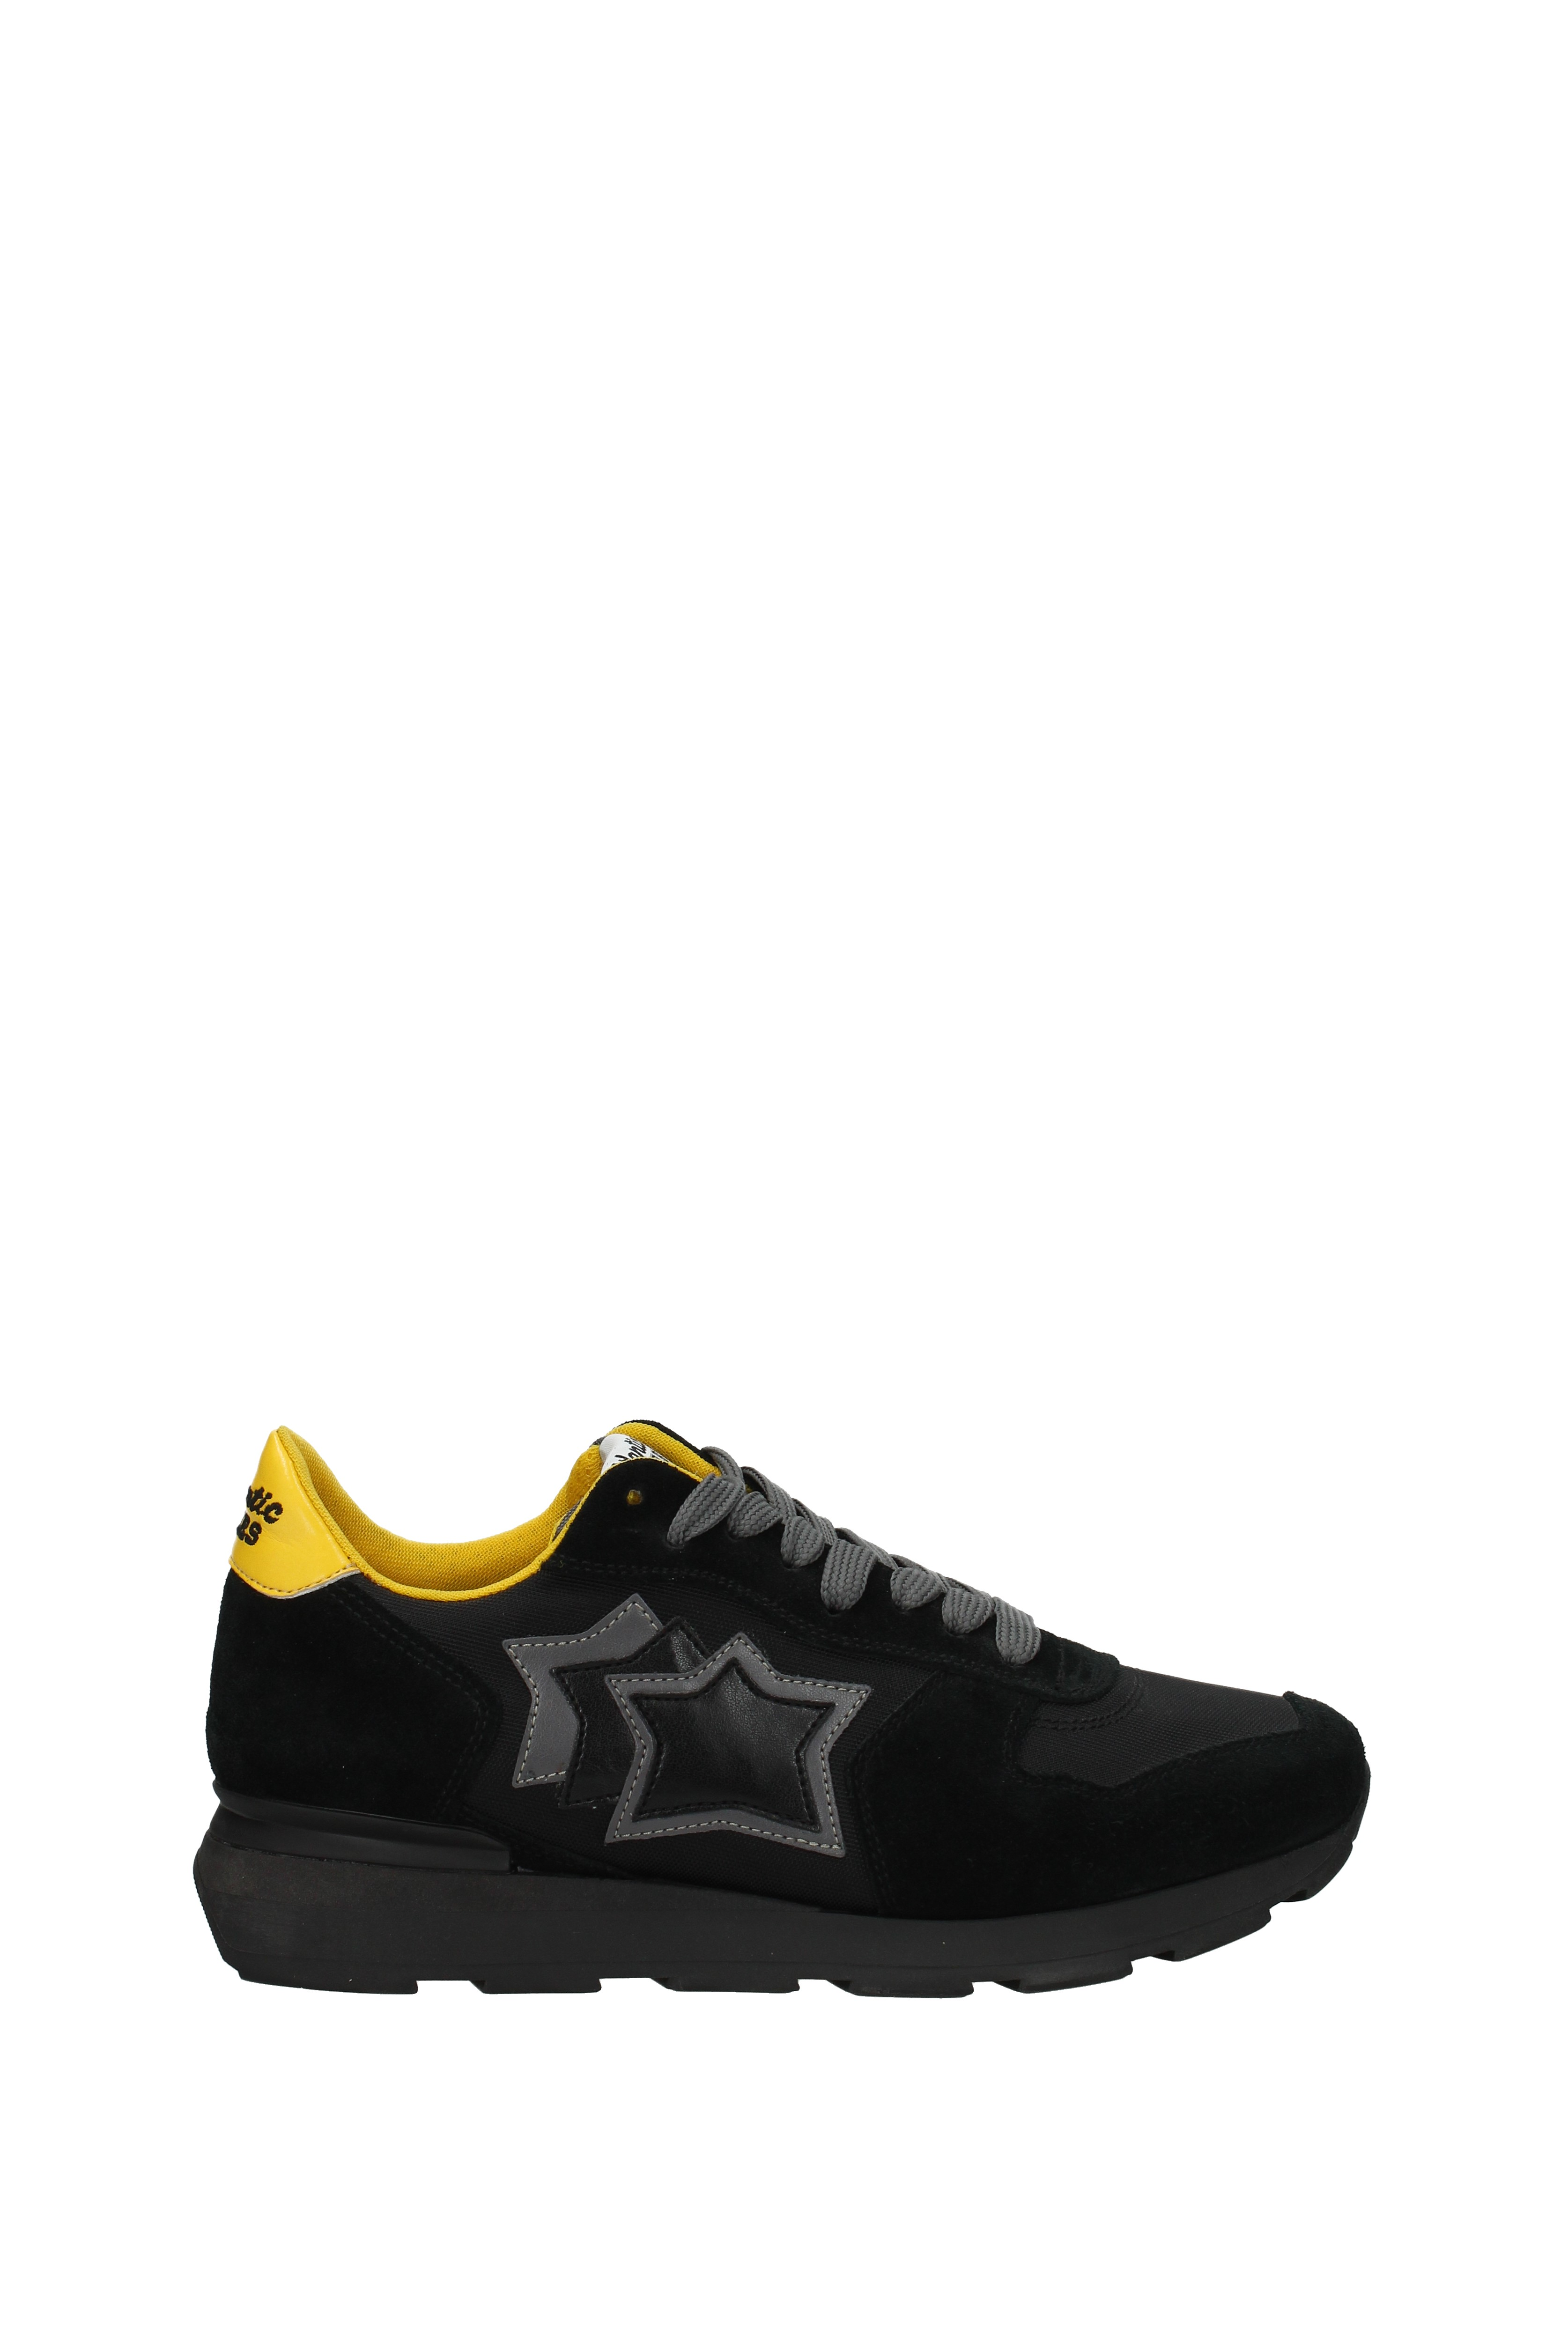 release date d3f3f 8b206 ... Nike Air Jordan Jordan Jordan gold moment Retro 6 DS SIZE 12.5 (rare  Size) ...